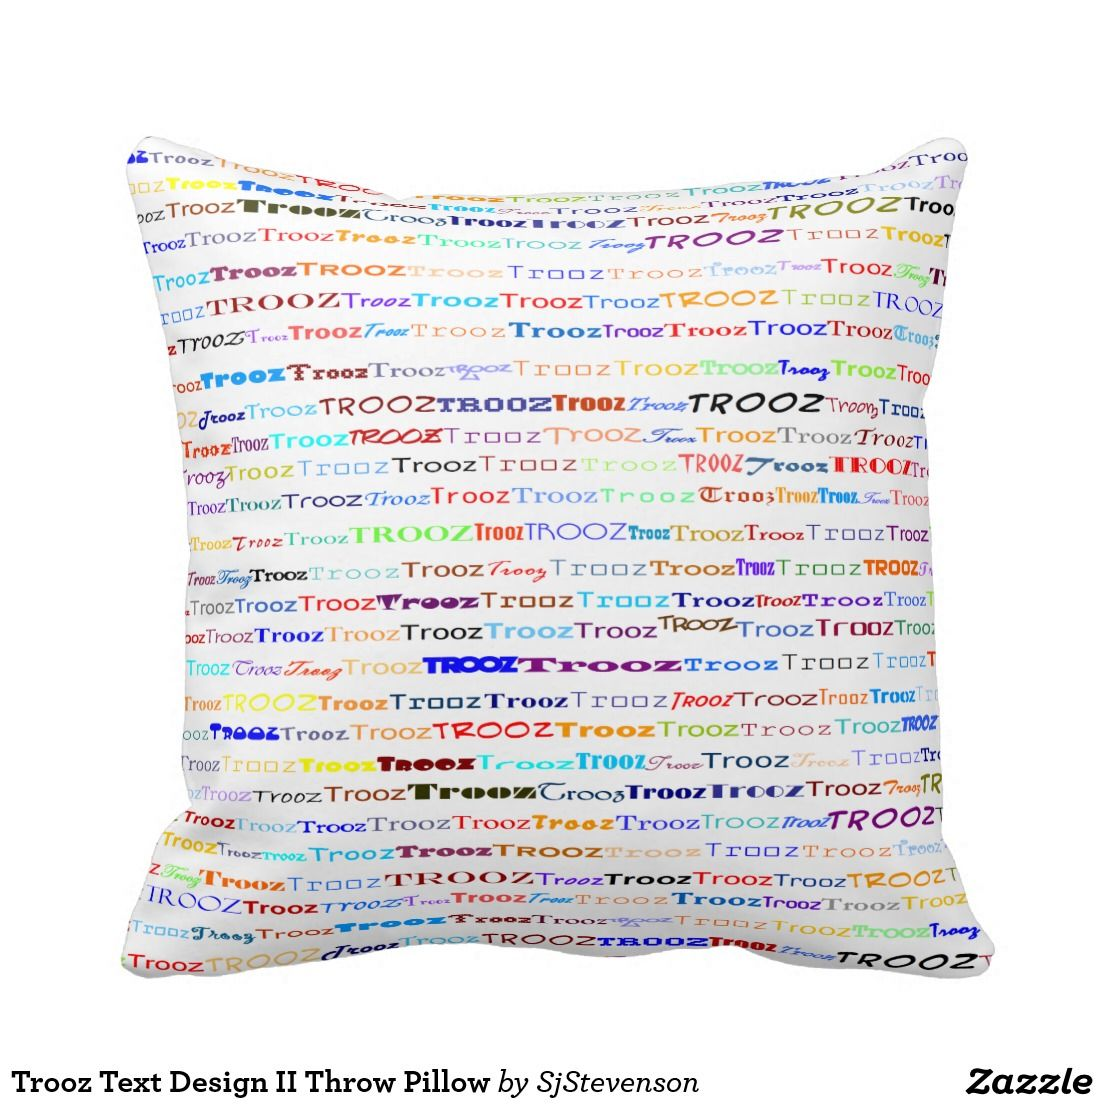 Trooz text design ii throw pillow text design throw pillows and